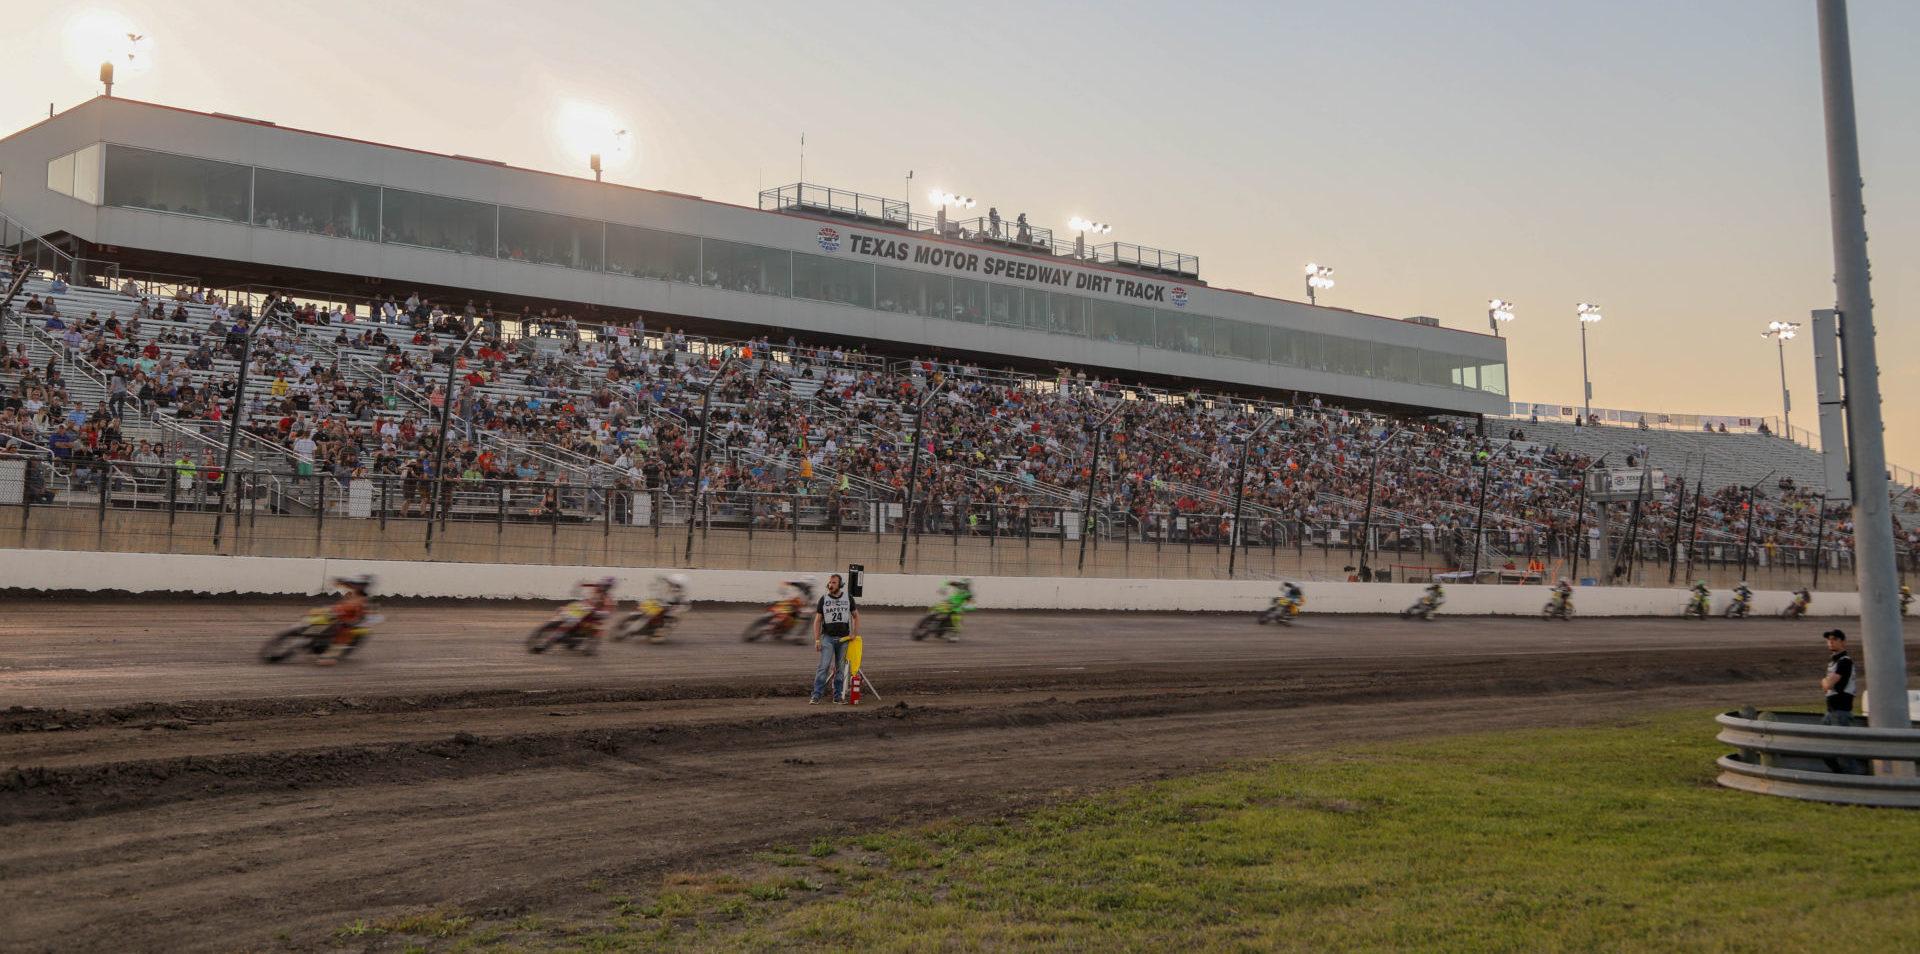 Texas Motor Speedway. Photo by Scott Hunter, courtesy AFT.